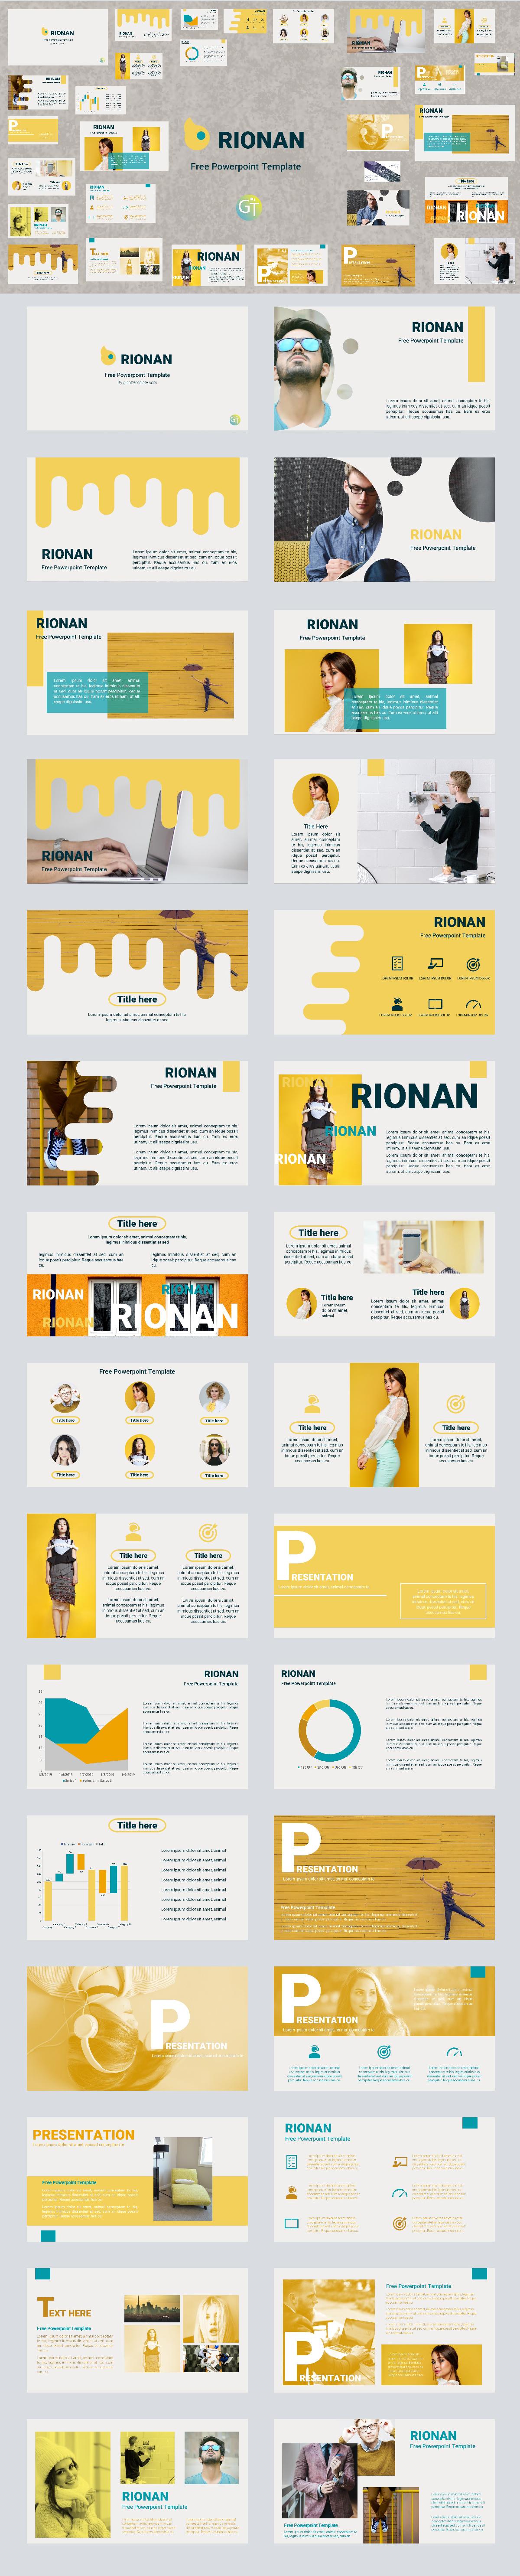 Rionan Free Powerpoint Template On Behance